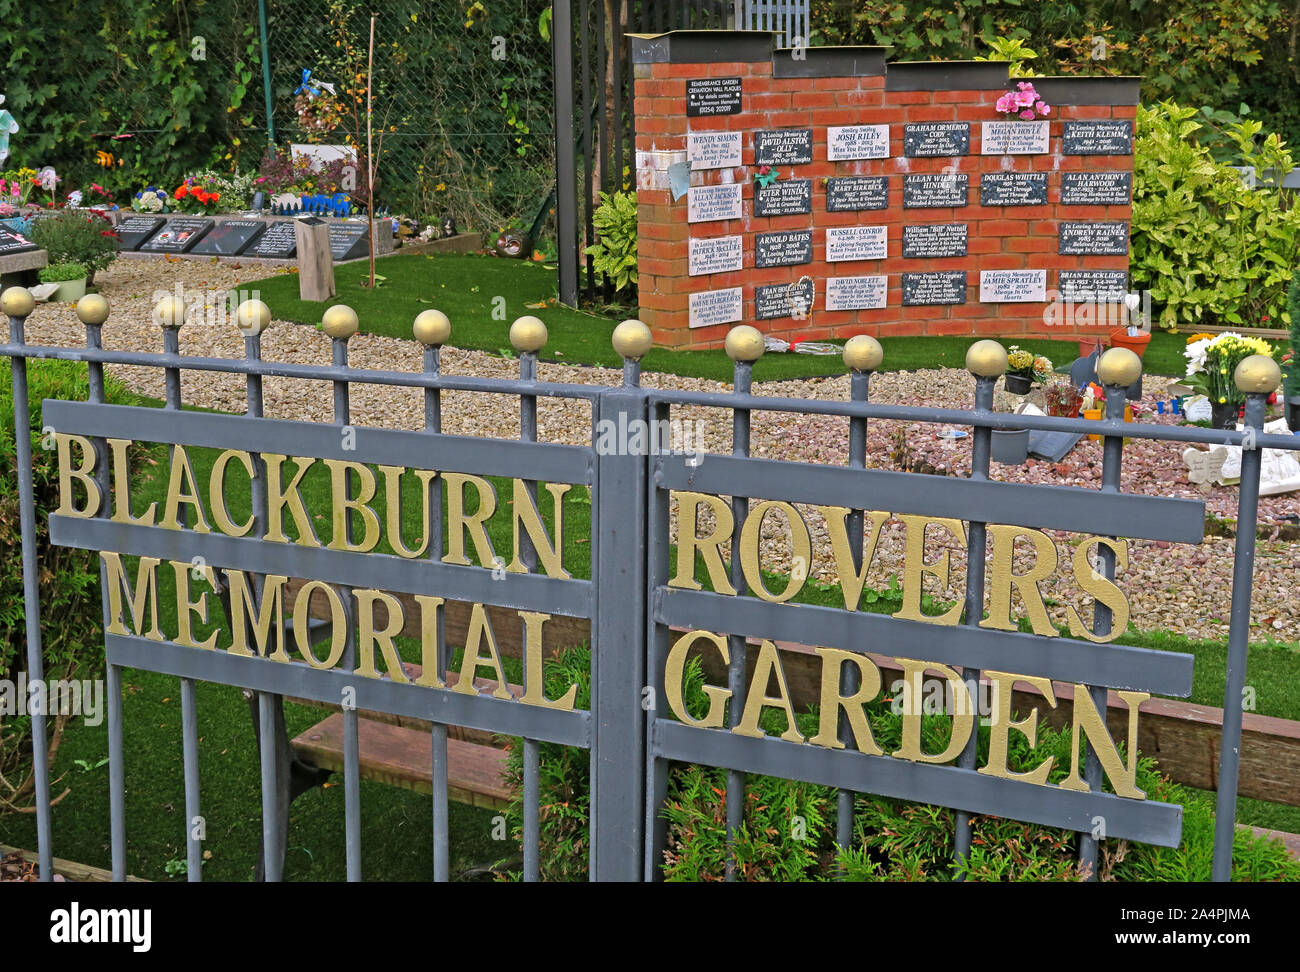 Blackburn Rovers FC Memorial Garden, Football Stadium, Ewood, Lancashire, England, UK, BB2 4JF Stock Photo